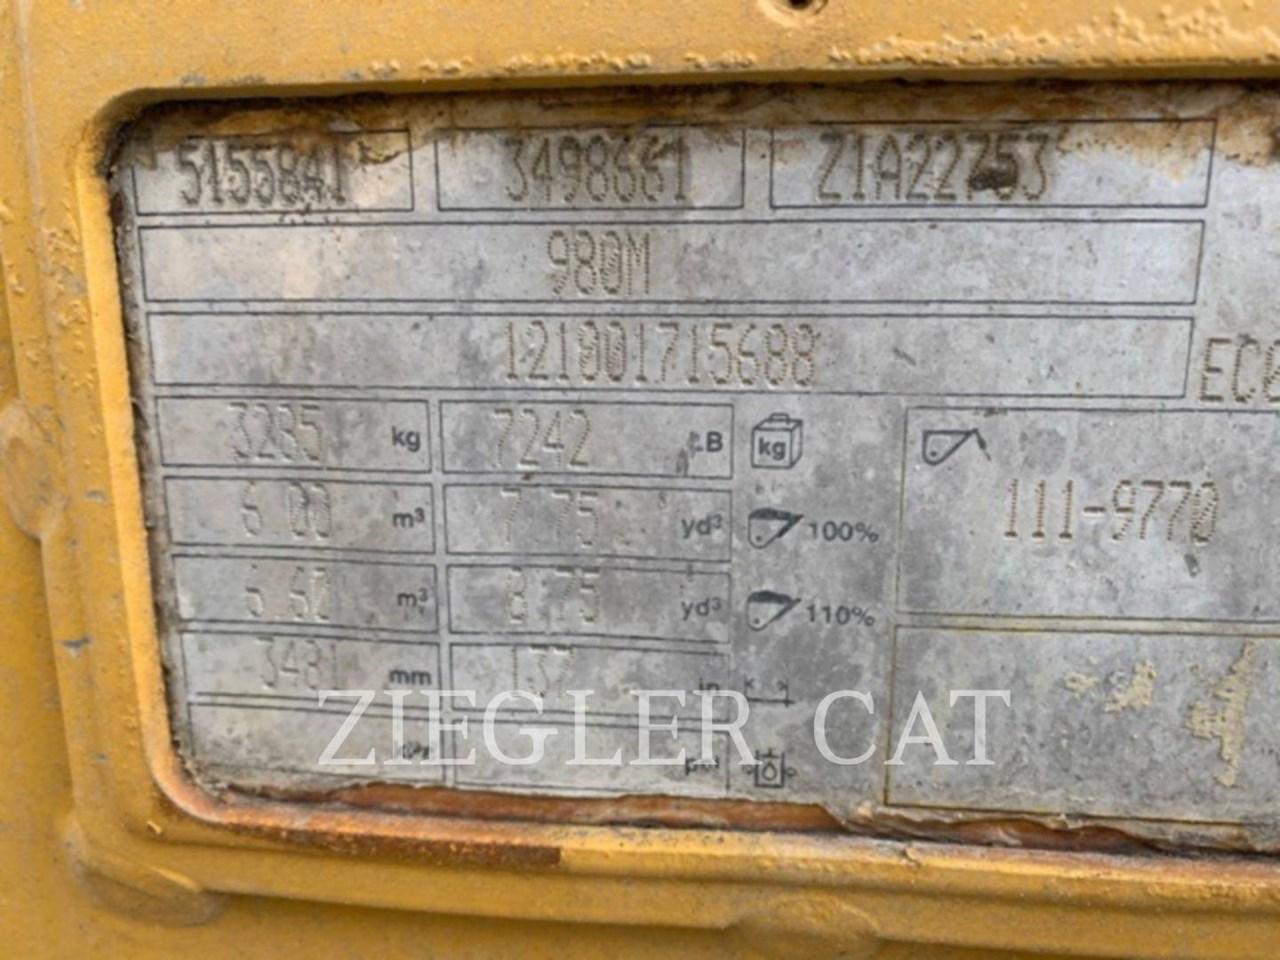 2018 Caterpillar 980M Image 9